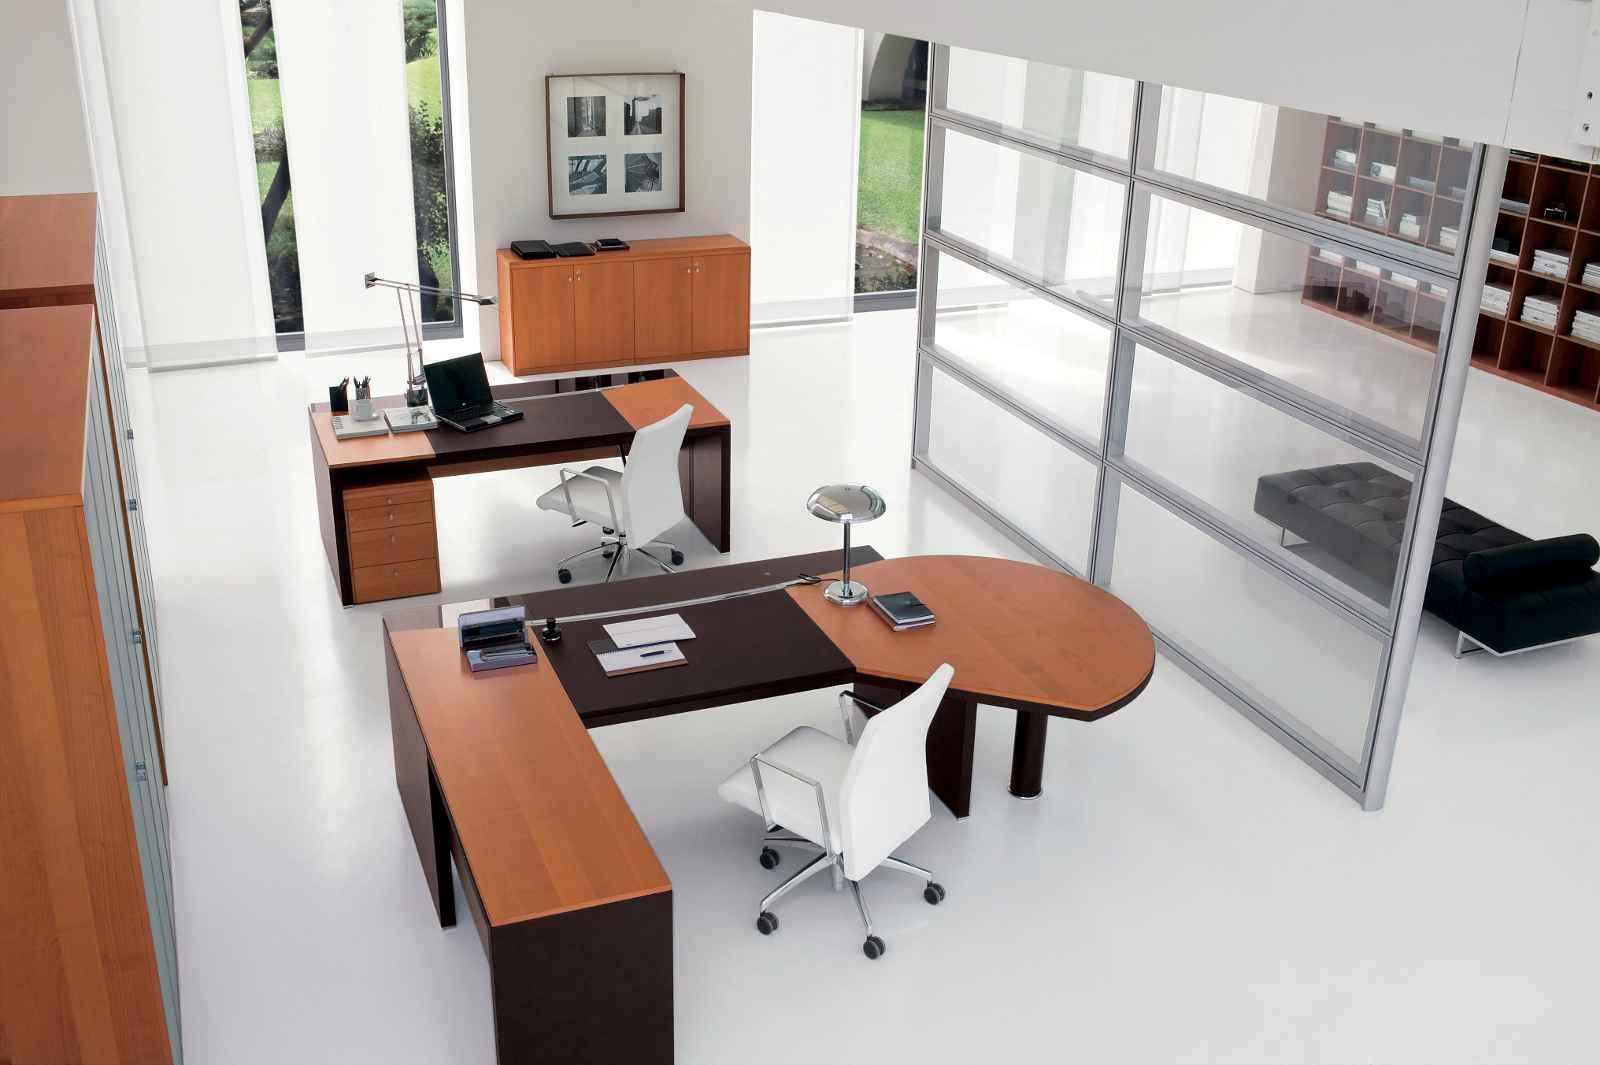 Clean-Worksplace-with-Regular-Maintenance.jpg